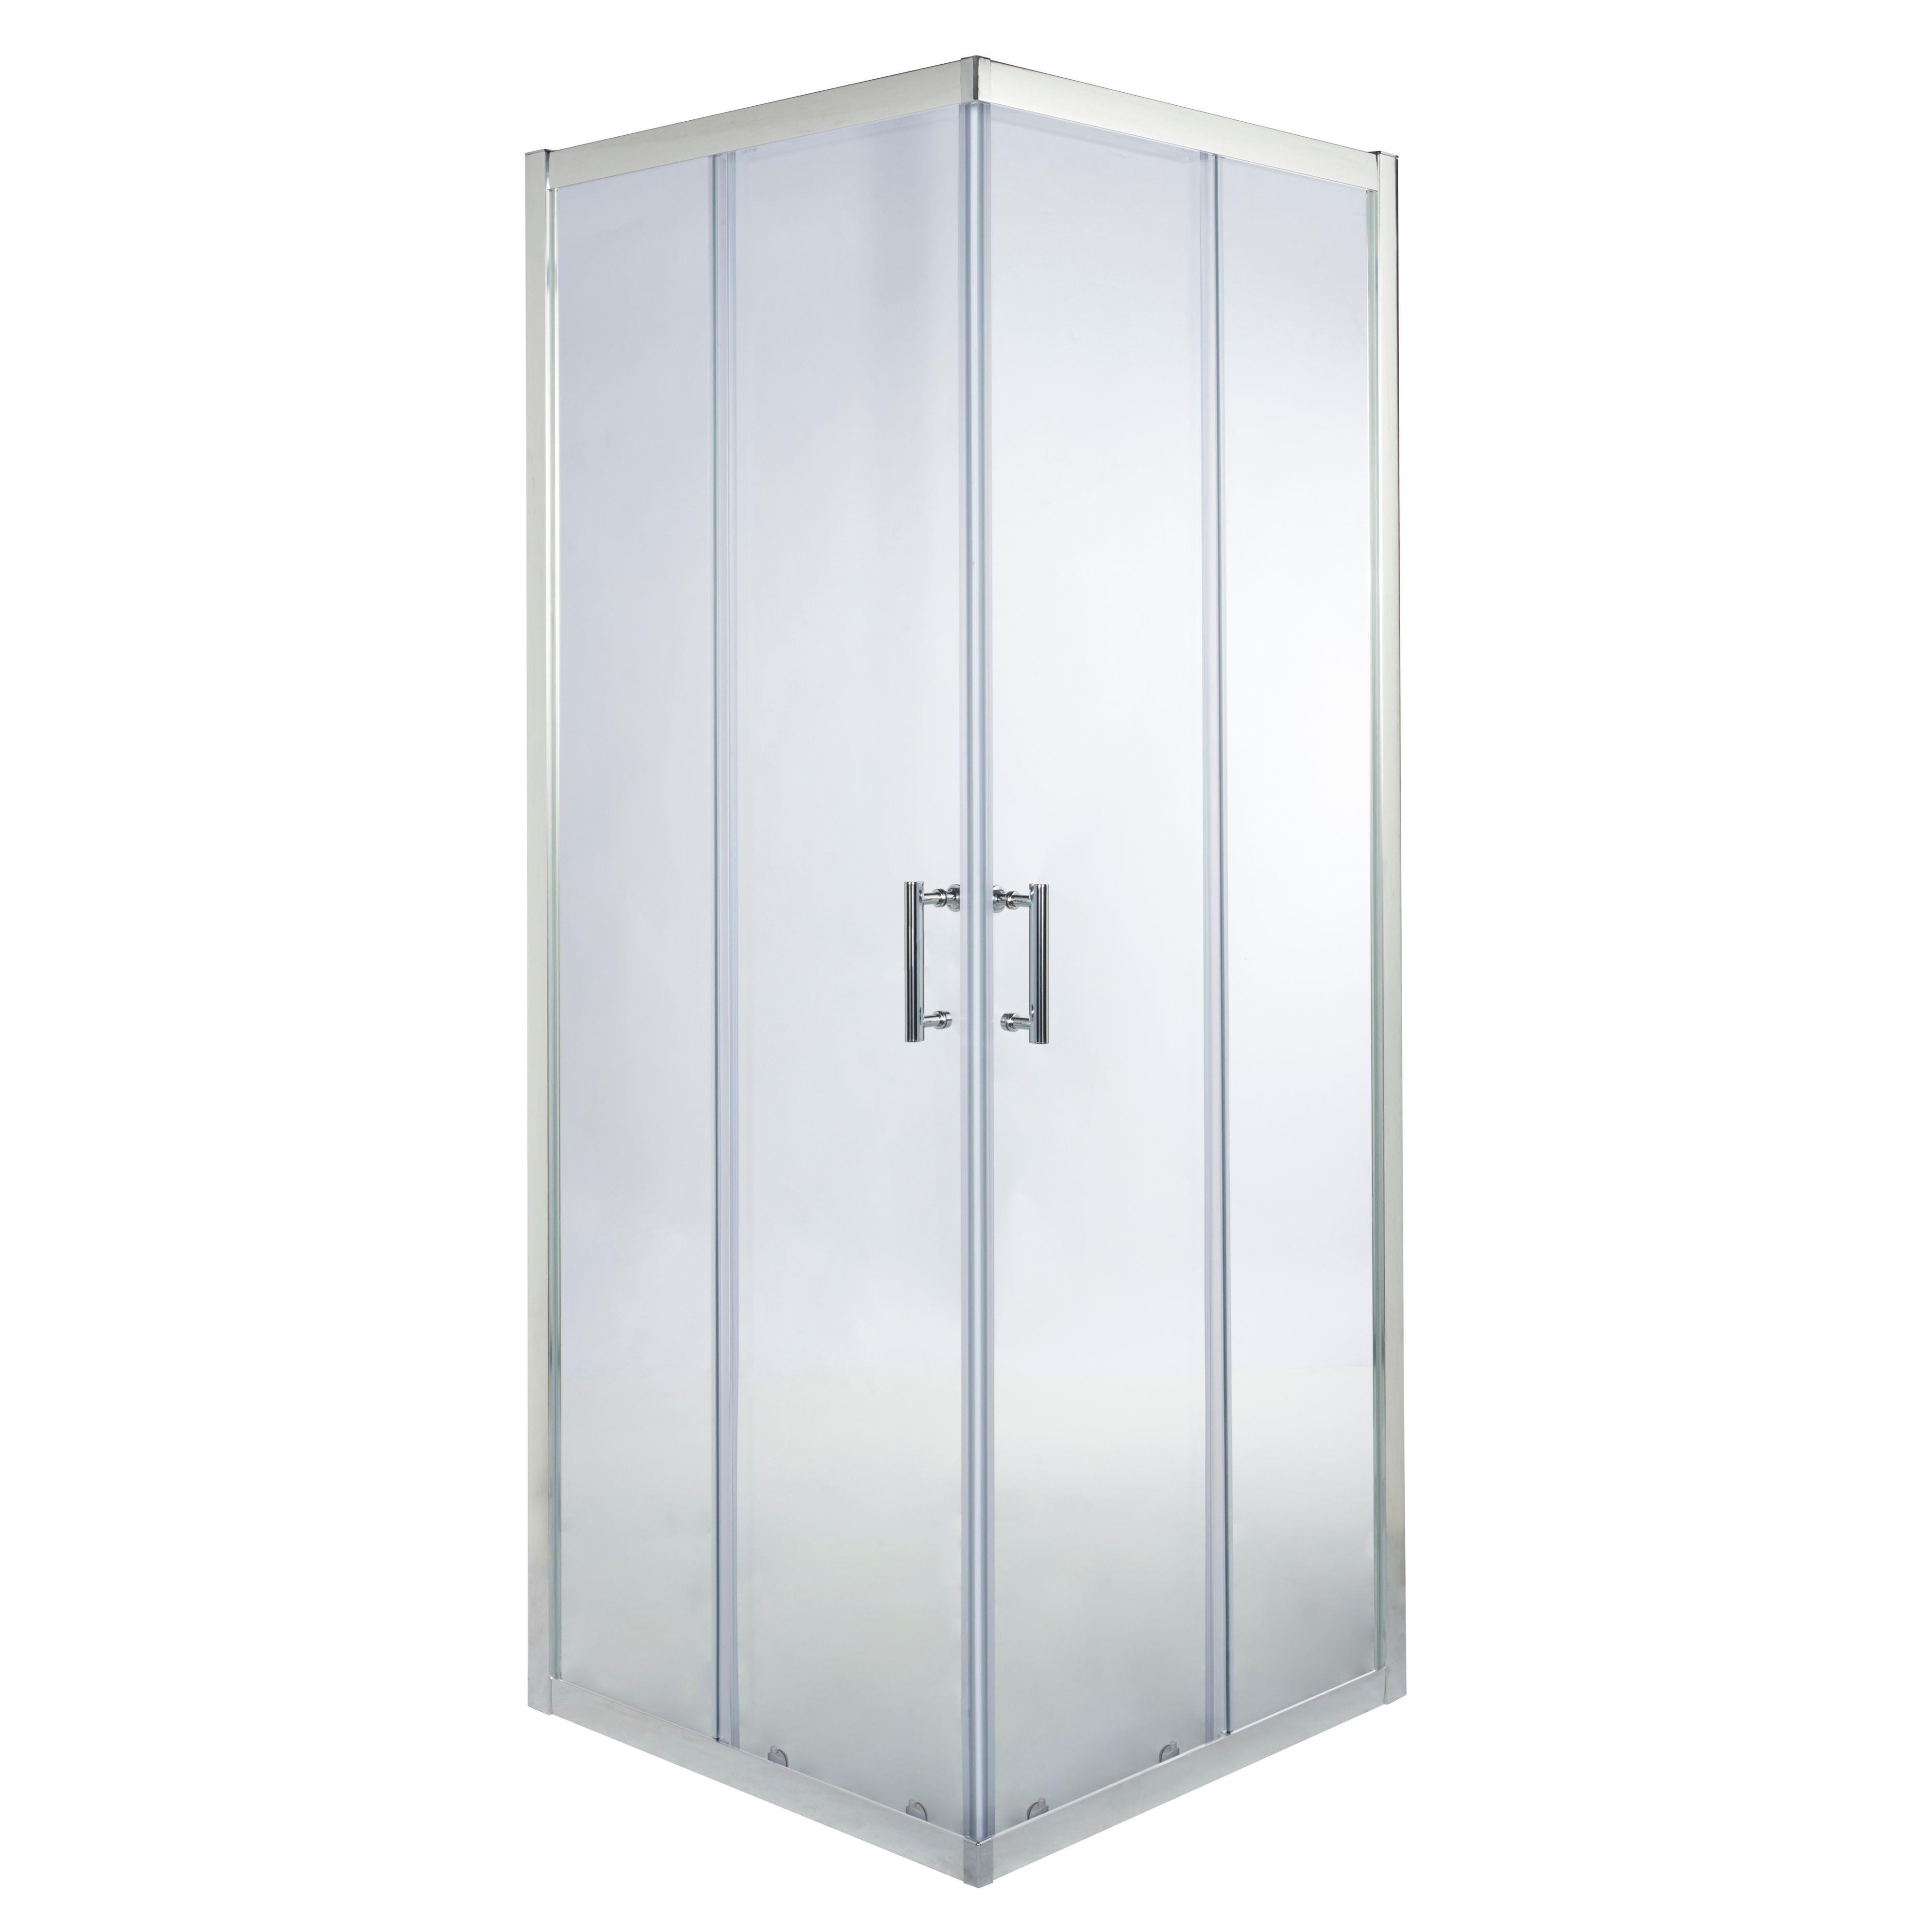 Cooke & Lewis Onega Square Shower Enclosure With Corner Entry Double Sliding Door (w)700mm (d)700mm